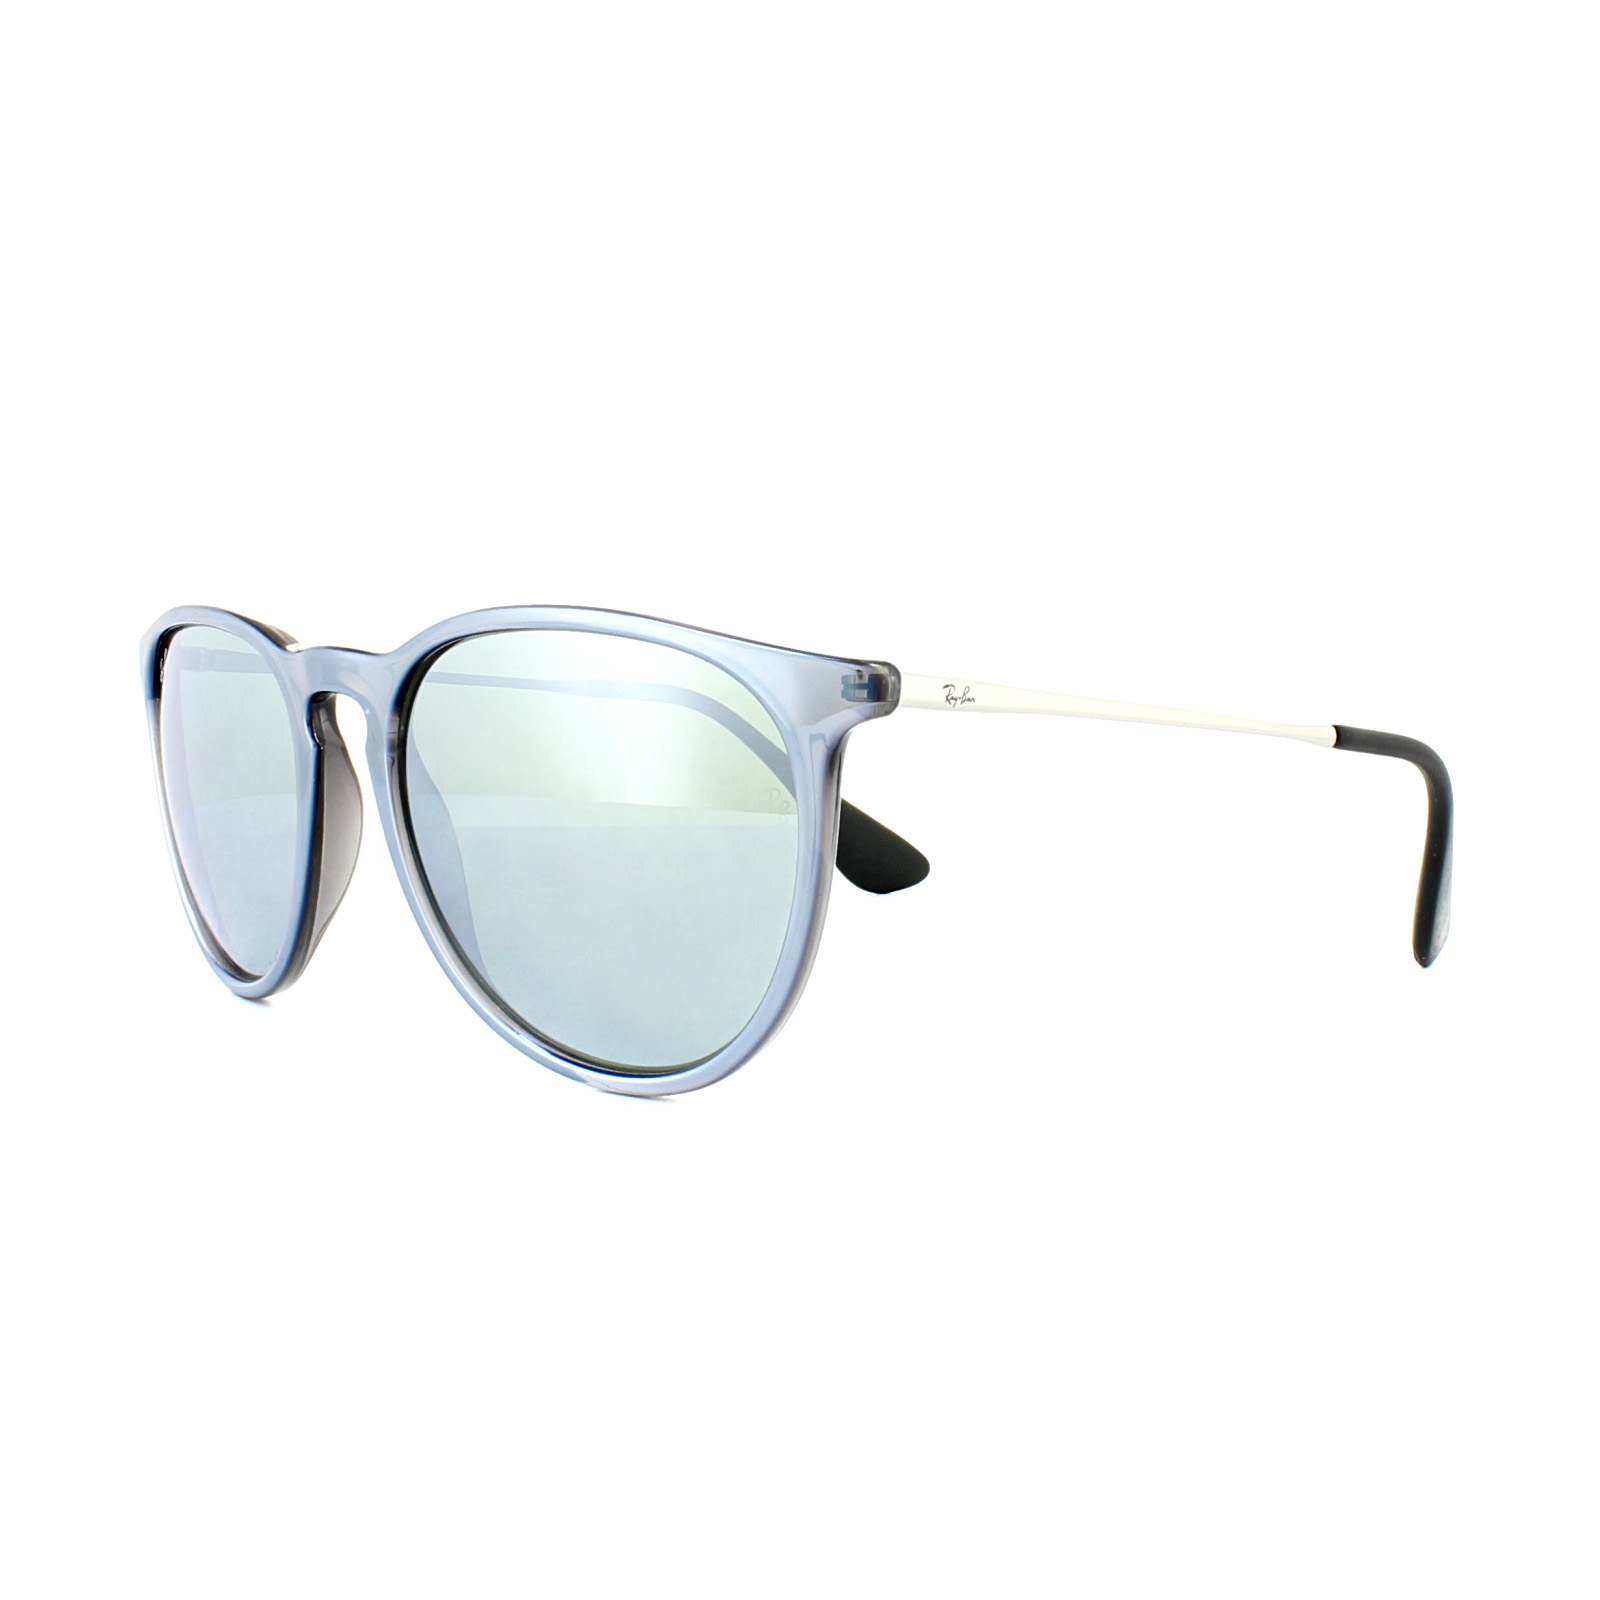 8b4fd89110 Sentinel Ray-Ban Sunglasses Erika 4171 631930 Grey Silver Silver Mirror